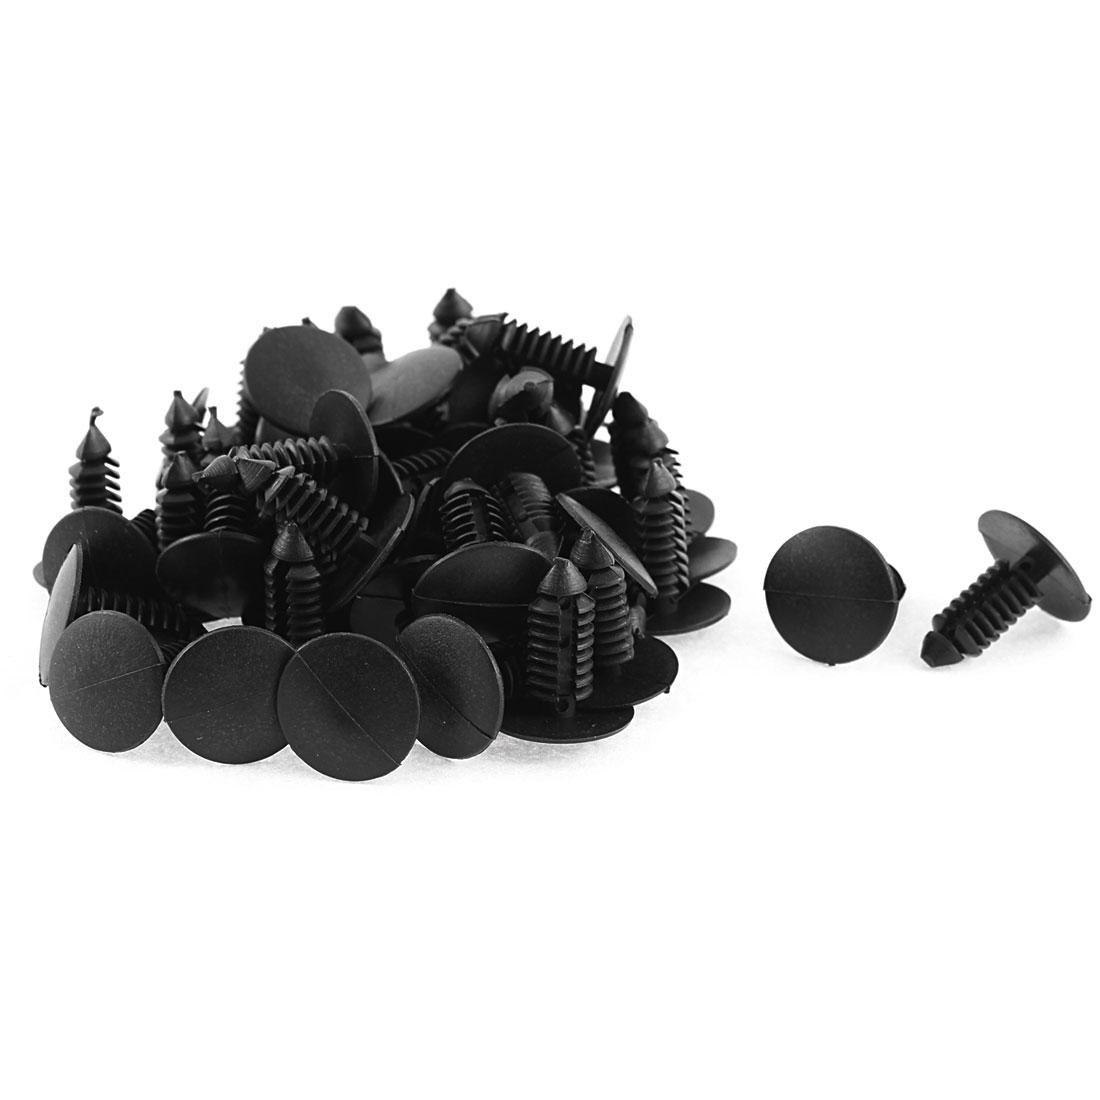 50 Pcs Car Trunk Boot Black Plastic Retainer Rivets for Chevrolet Hyundai